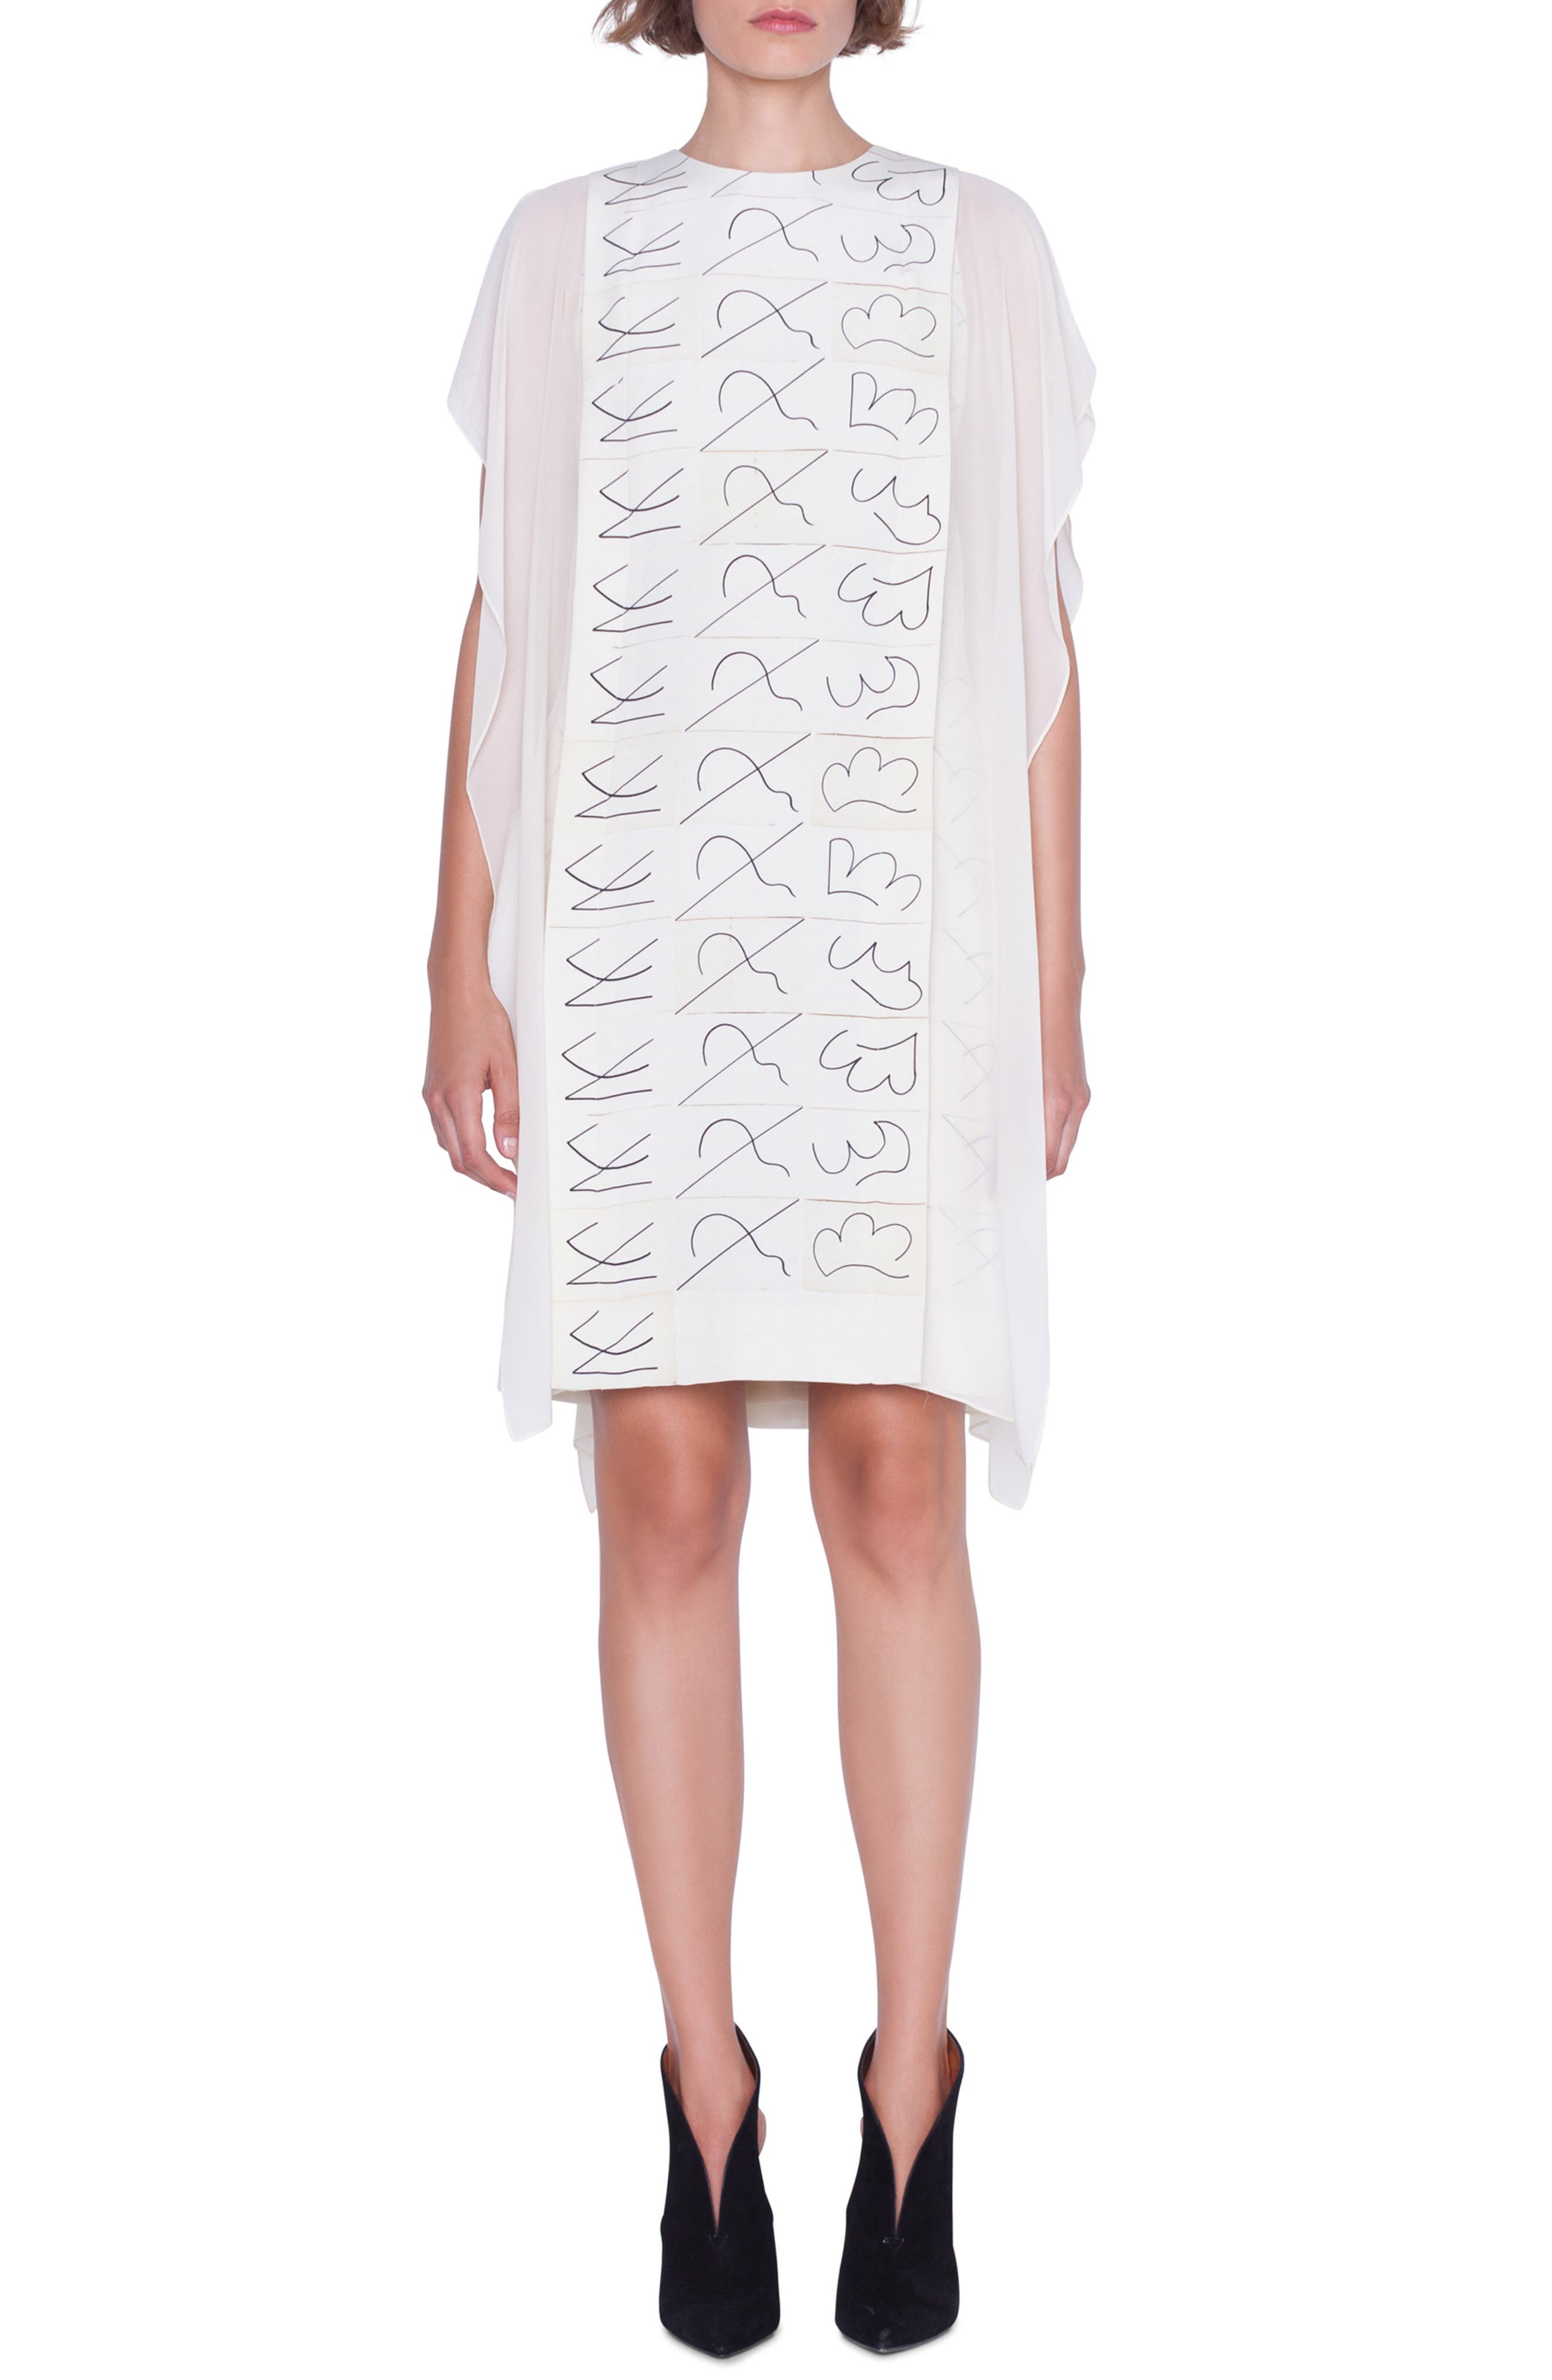 AKRIS, Leporello Print Cold Shoulder Silk Dress, Main thumbnail 1, color, PAPER